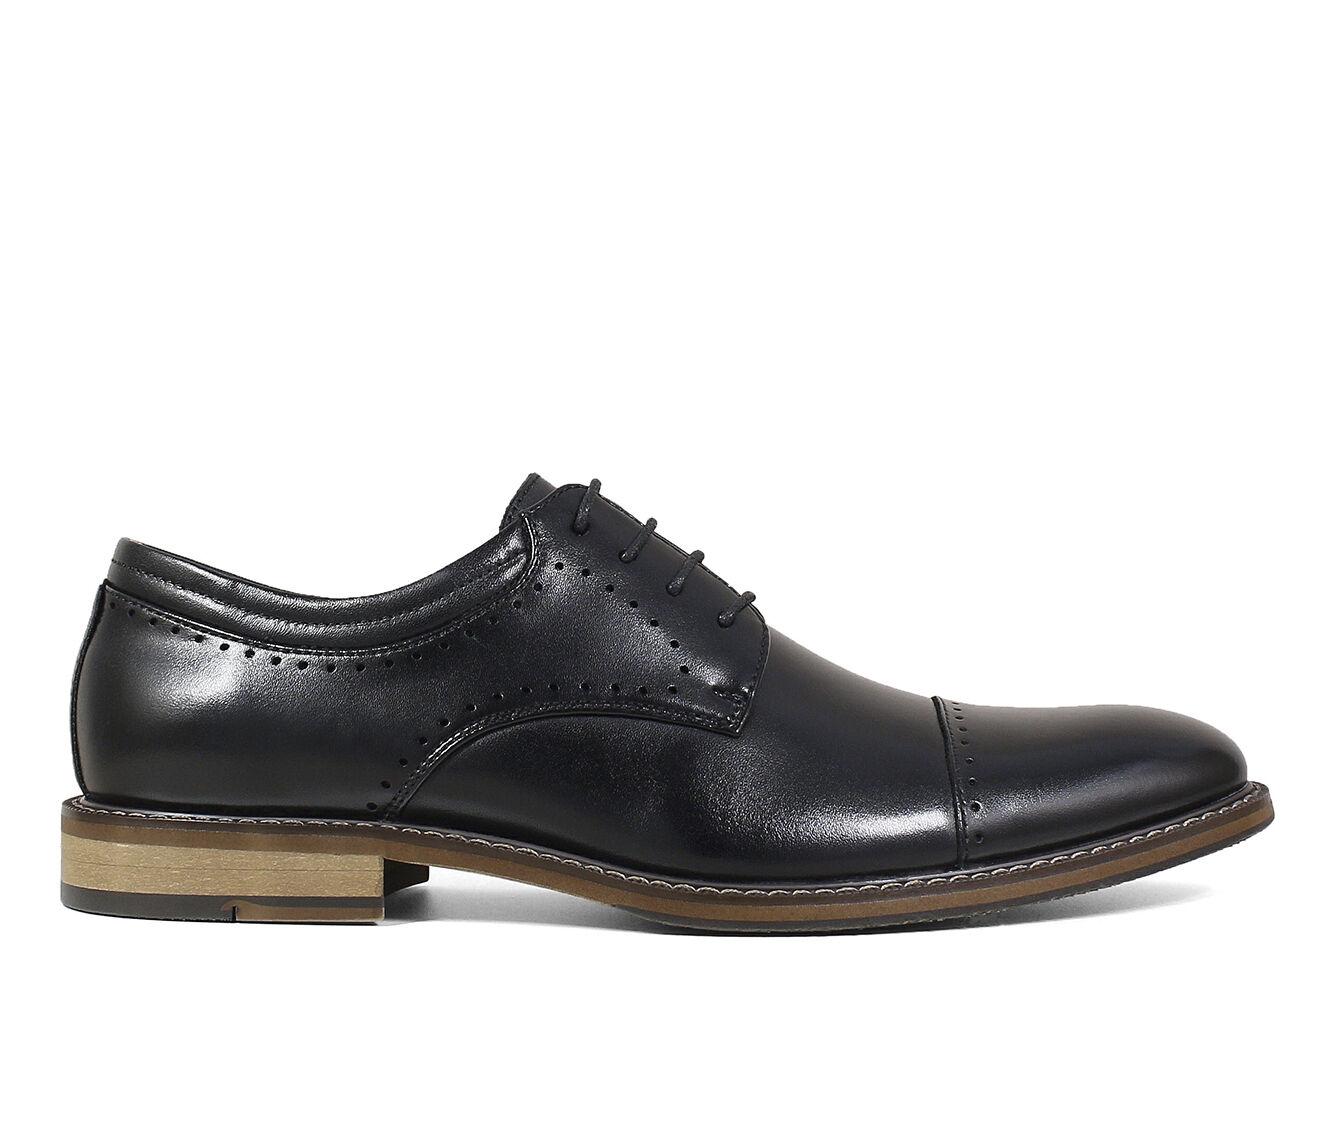 Men's Stacy Adams Flemming Dress Shoes Black